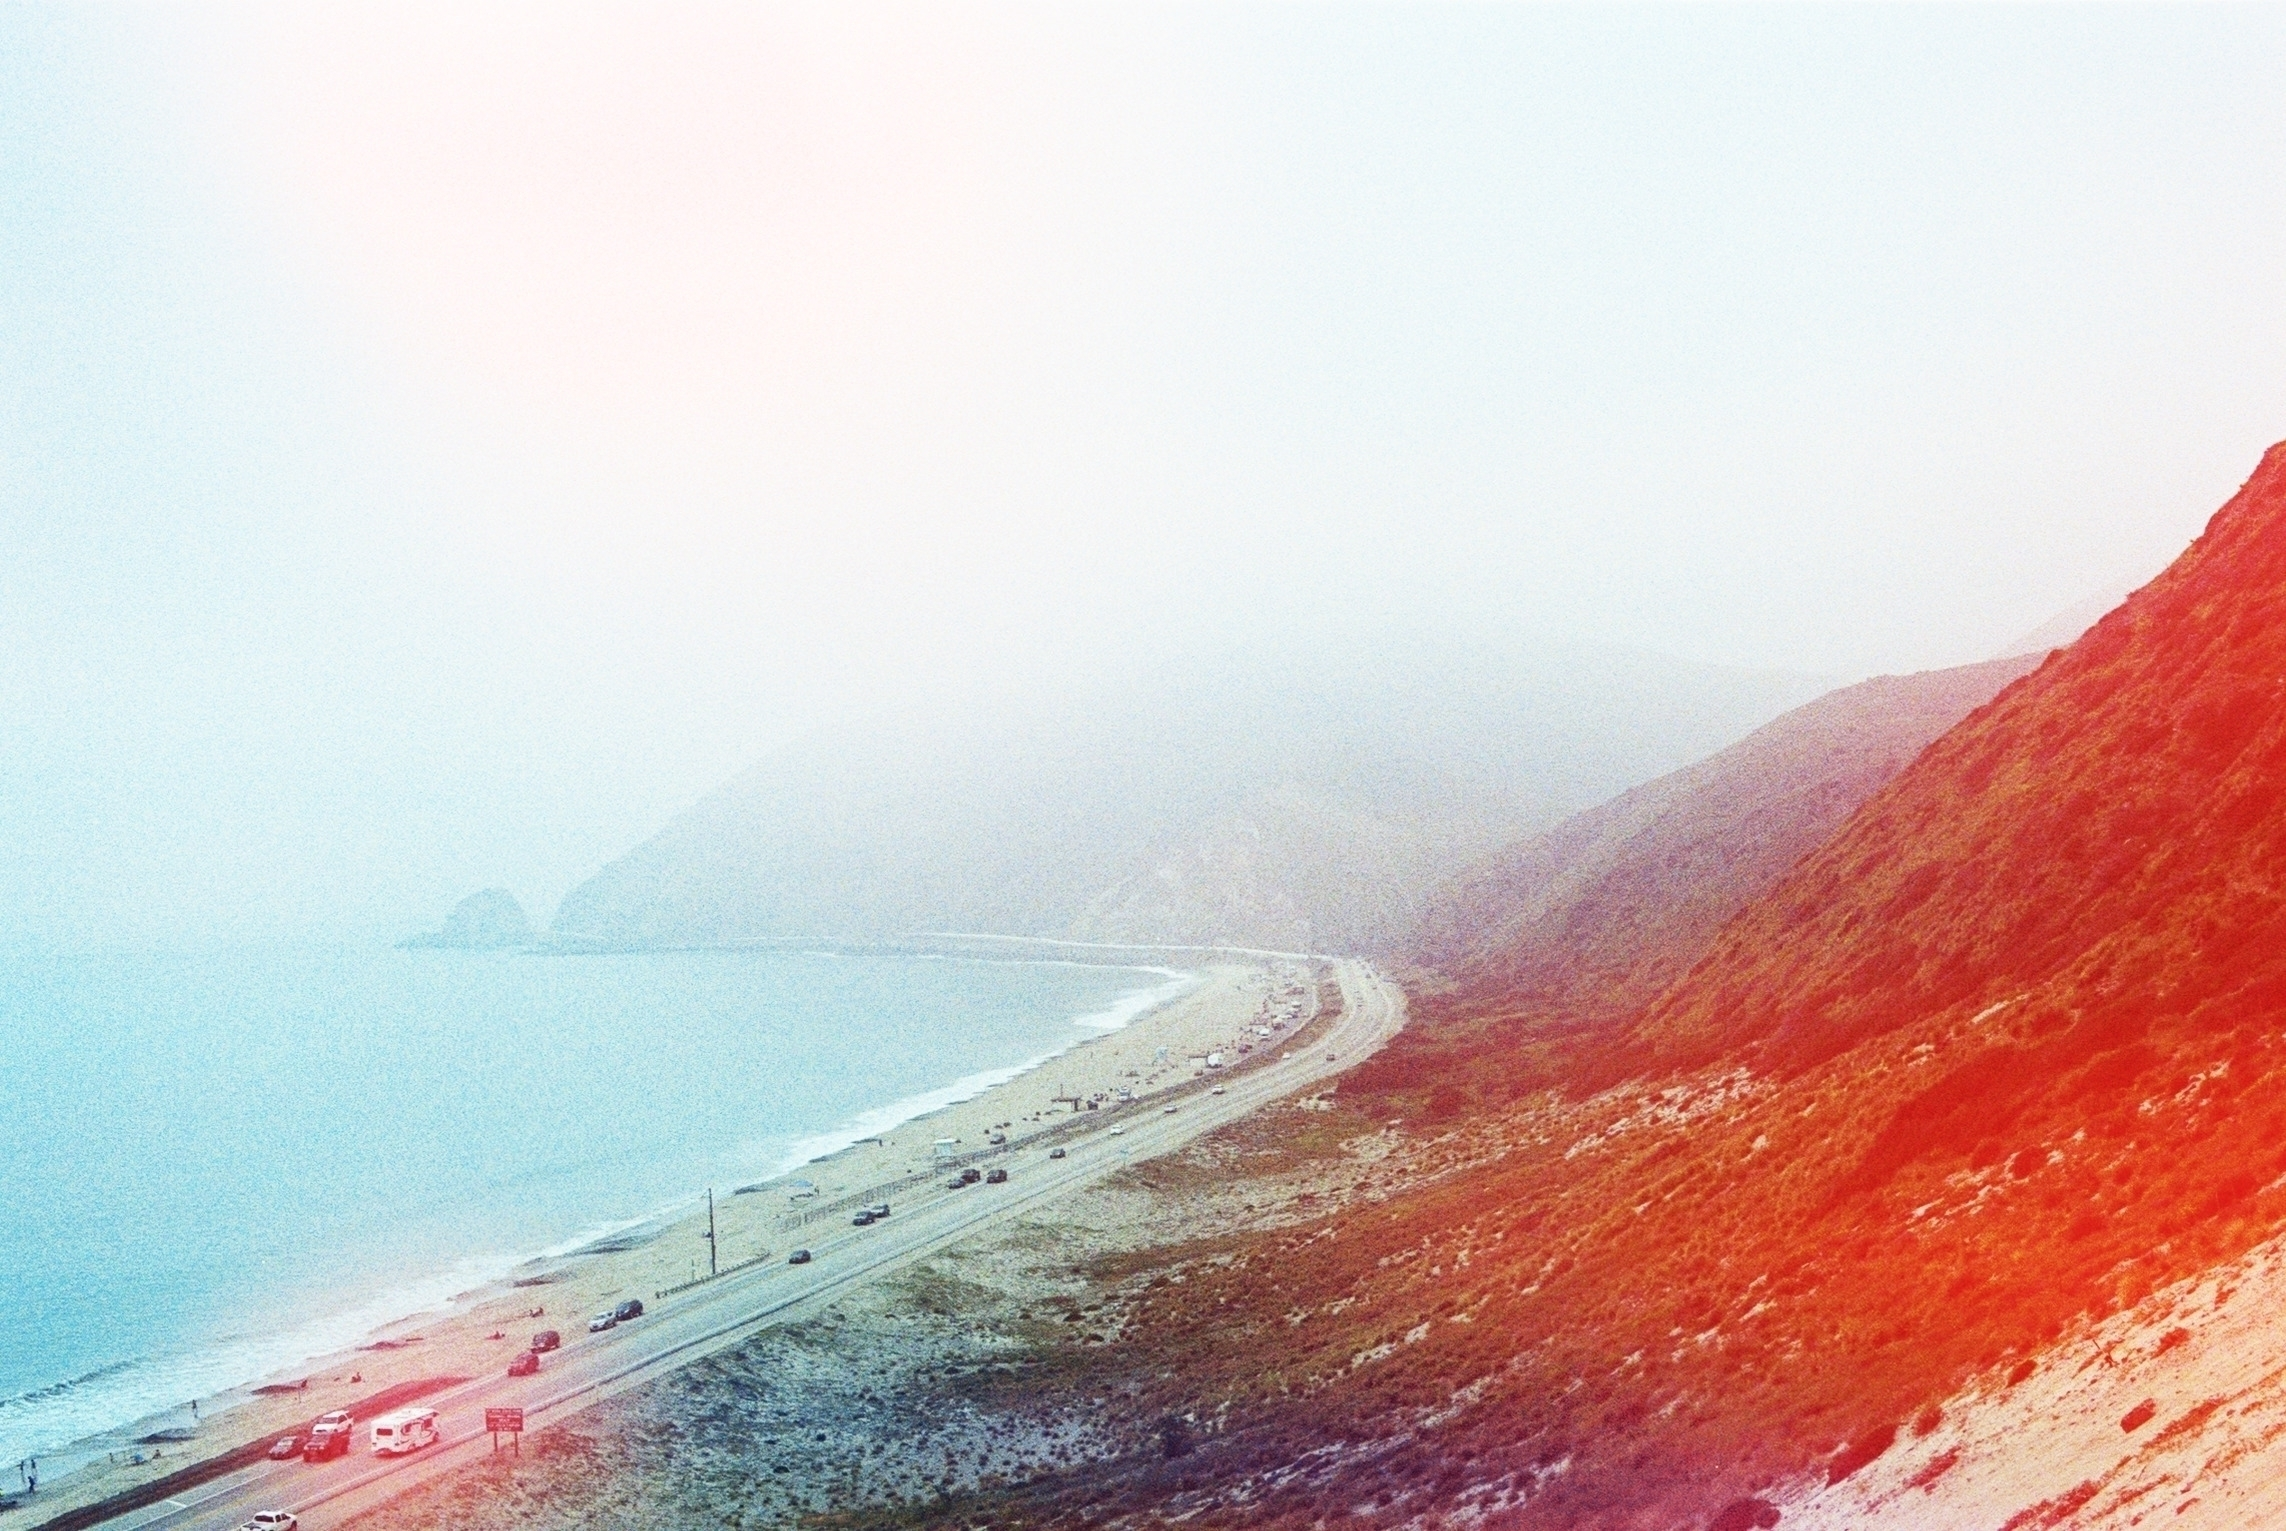 Chasing view! Malibu, CA Portfo - brianne-siegel | ello